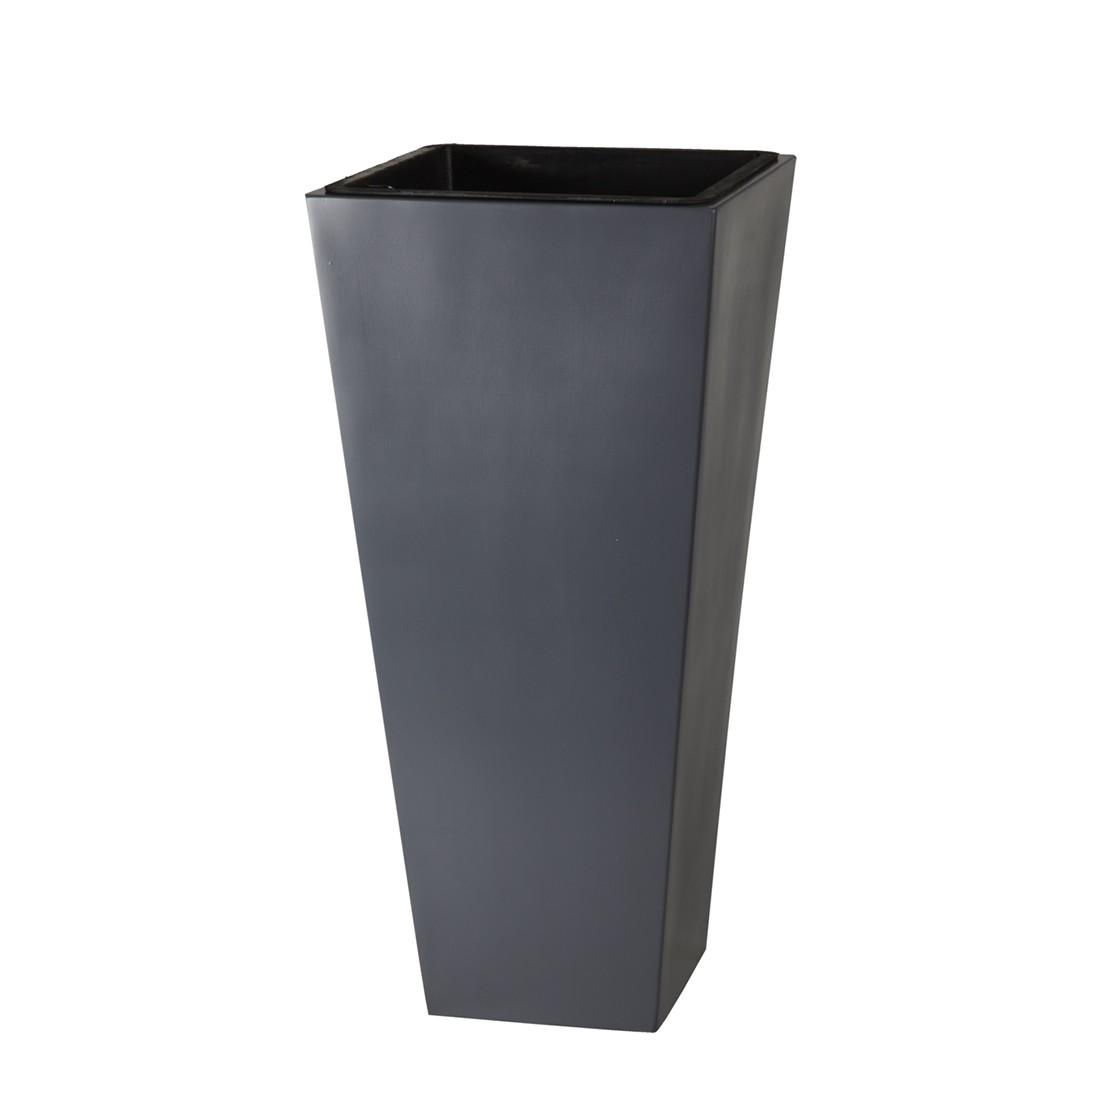 Pflanzkübel – 28 x 28 x 60 cm – Fiberglas – Grau, Gartenfreude günstig kaufen